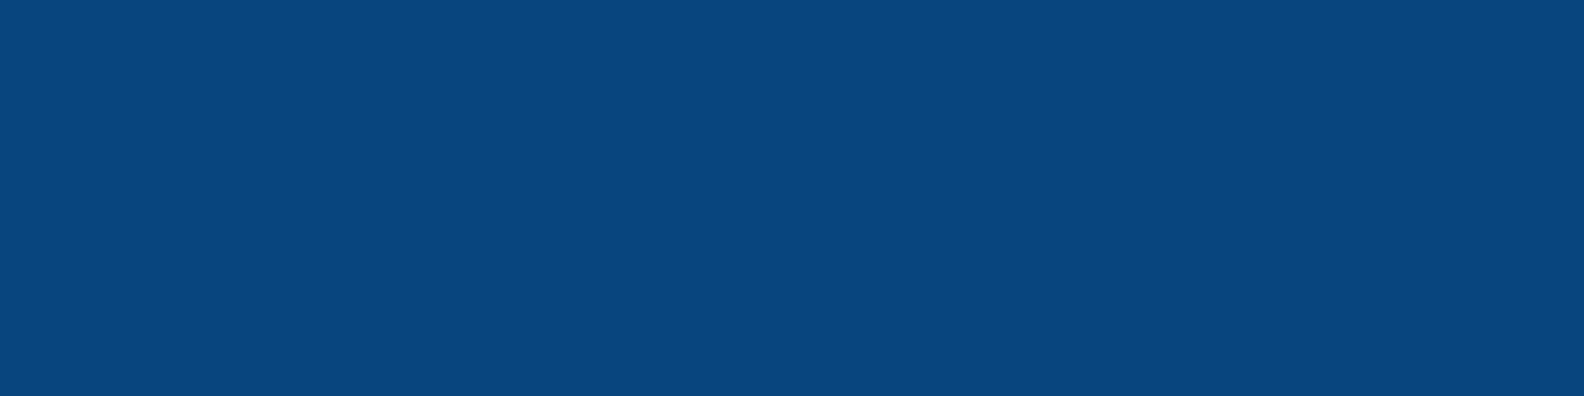 1584x396 Dark Cerulean Solid Color Background